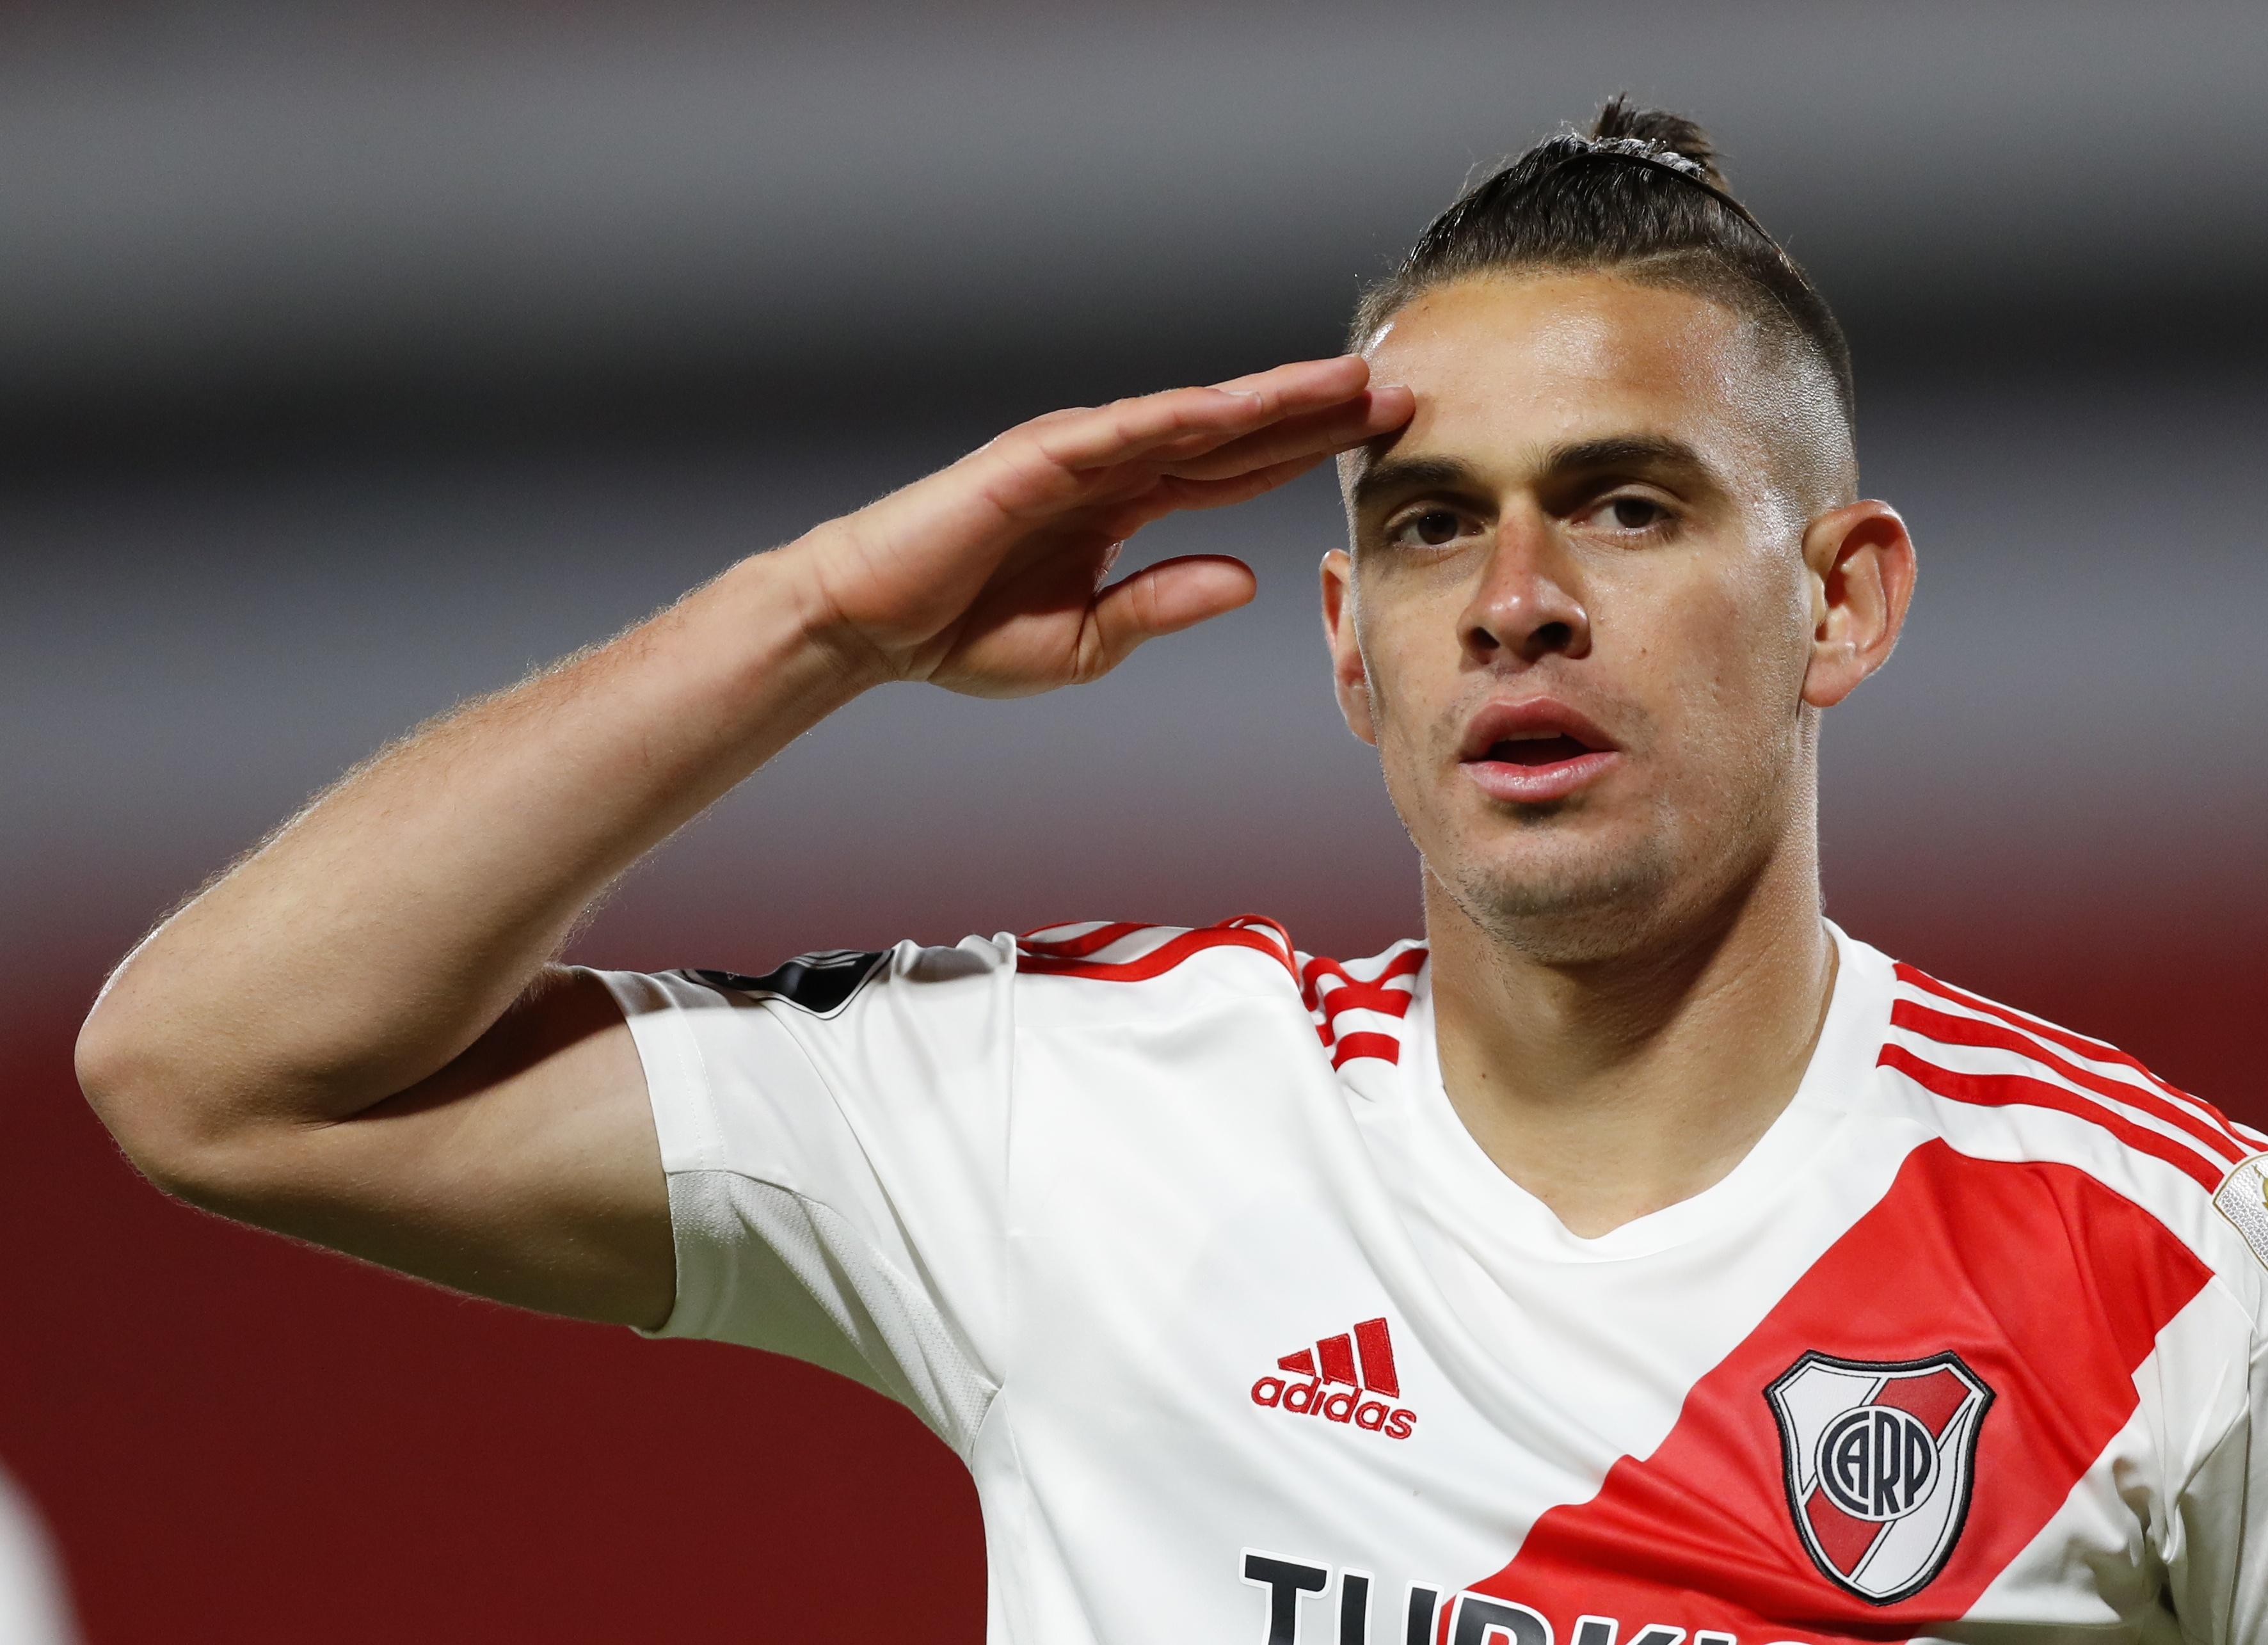 La carrera por fichar a Rafael Santos Borré sumó el interés de un poderoso  club europeo - Infobae